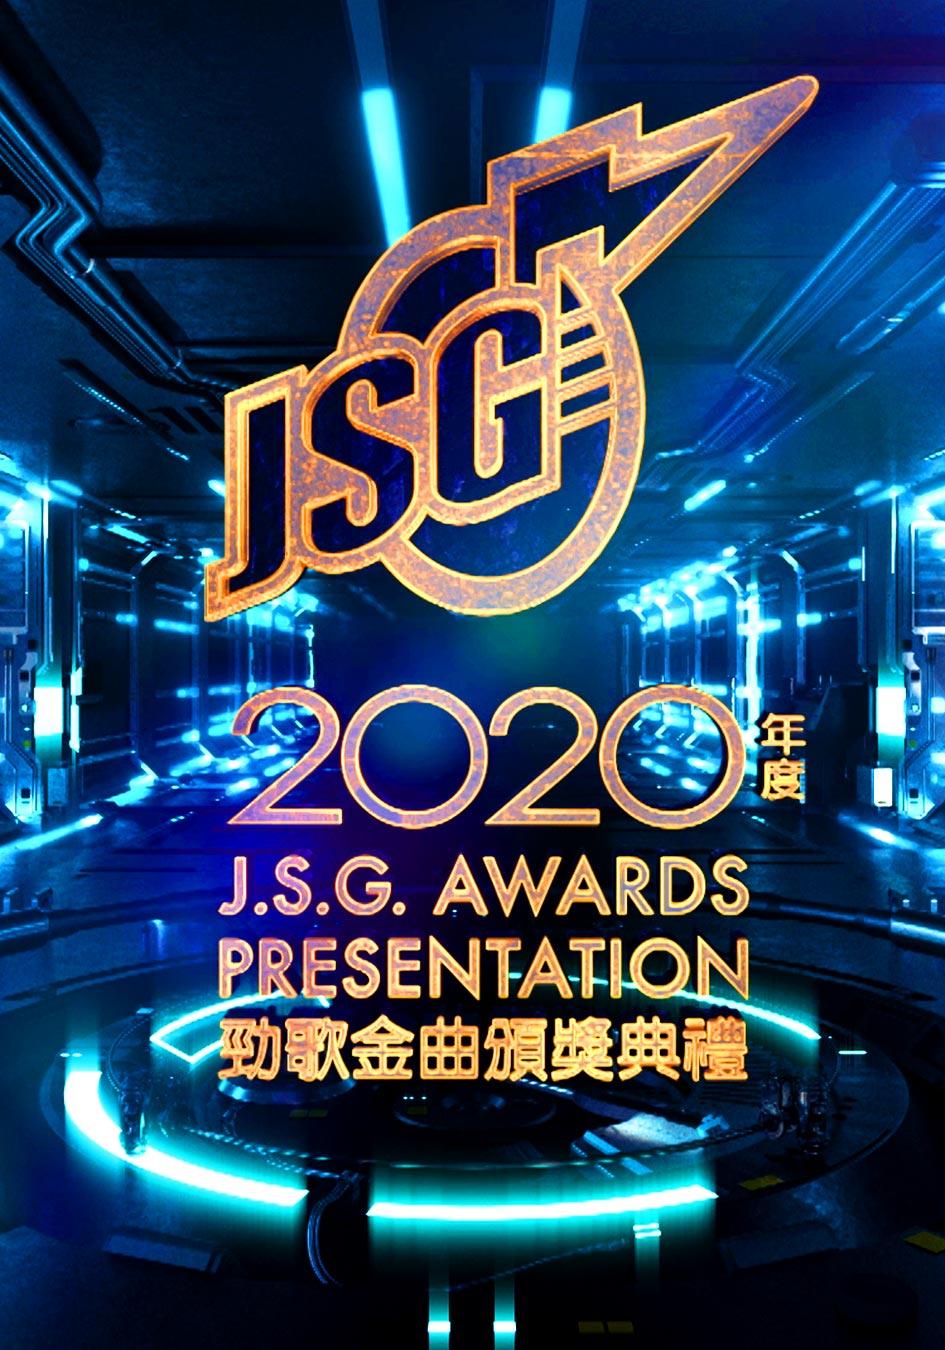 2020年度勁歌金曲頒獎典禮-JSG Awards Presentation 2020